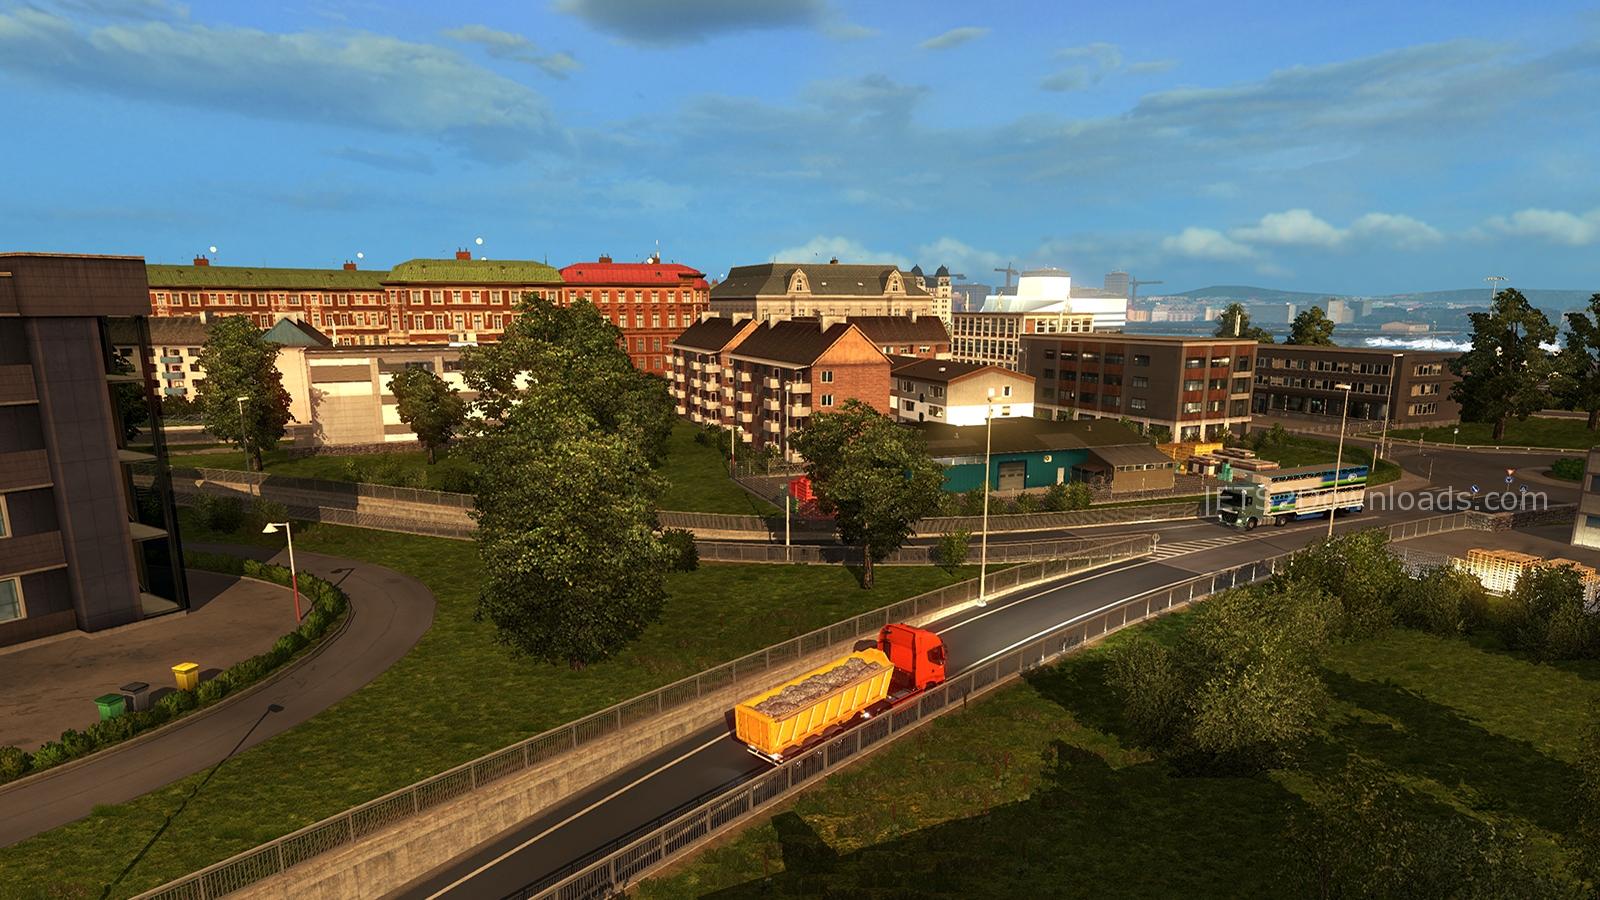 oslo-the-biggest-city-in-scandinavia-dlc-5